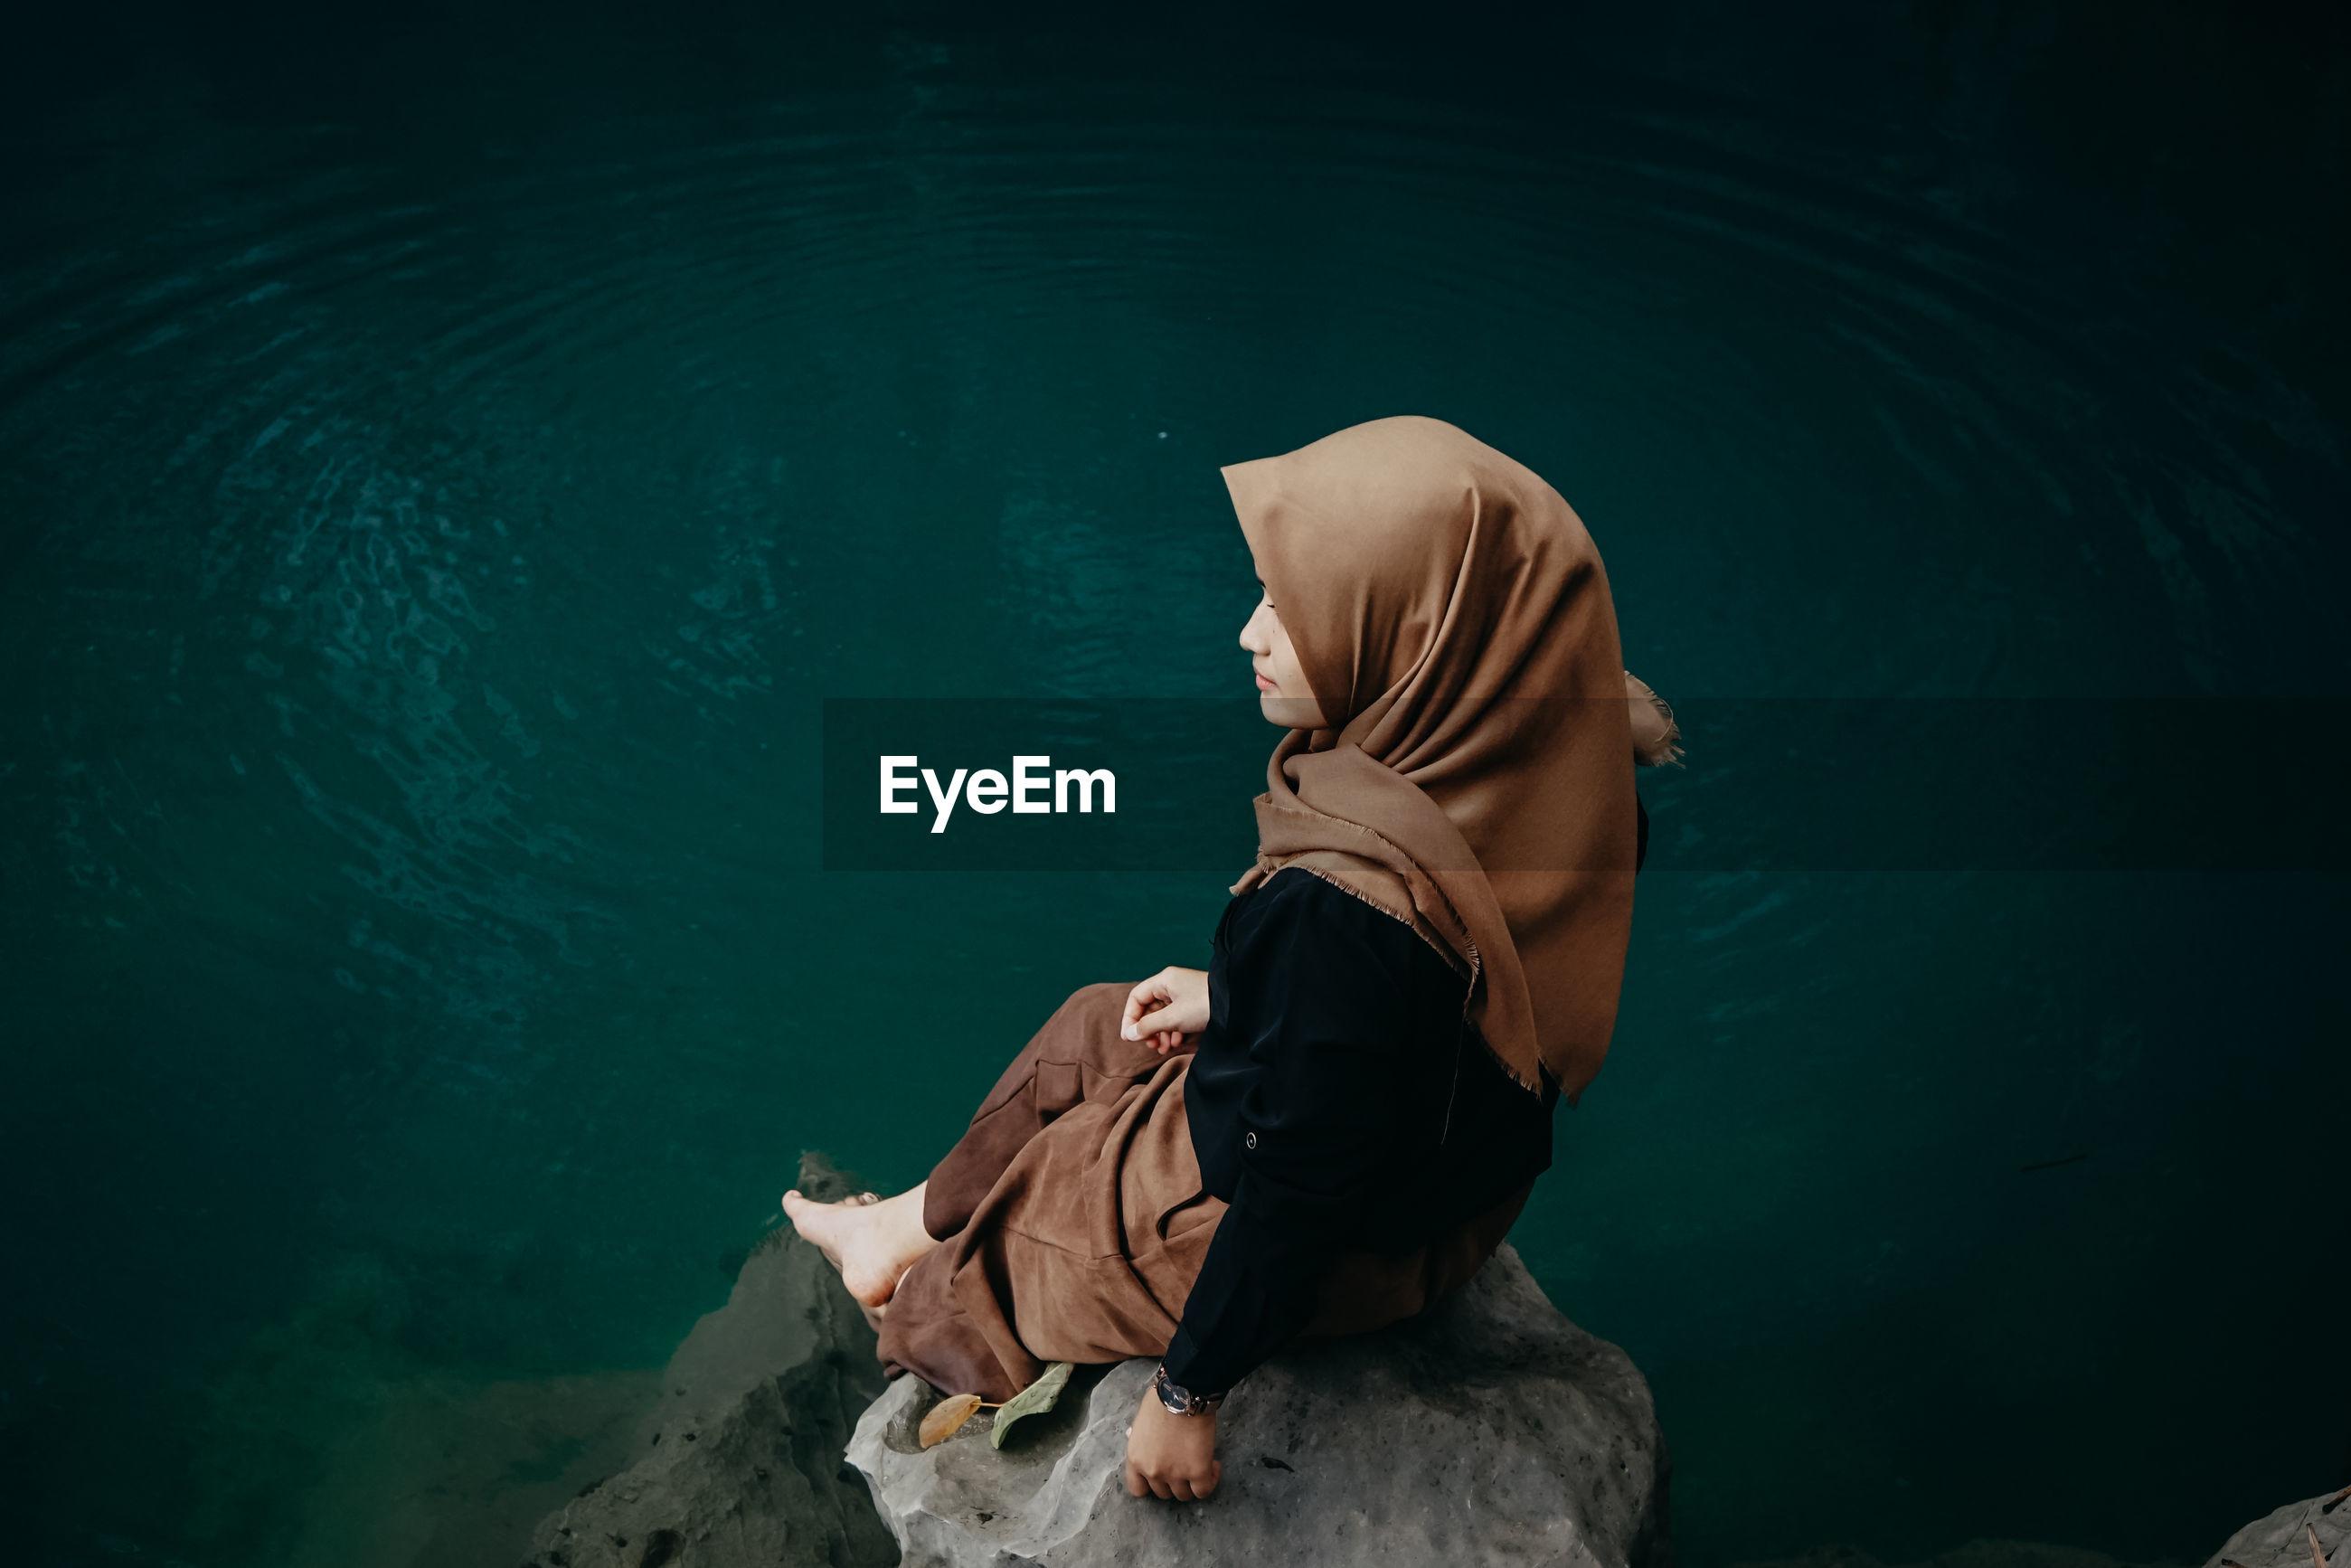 High angle view of woman wearing hijab sitting on rock by lake